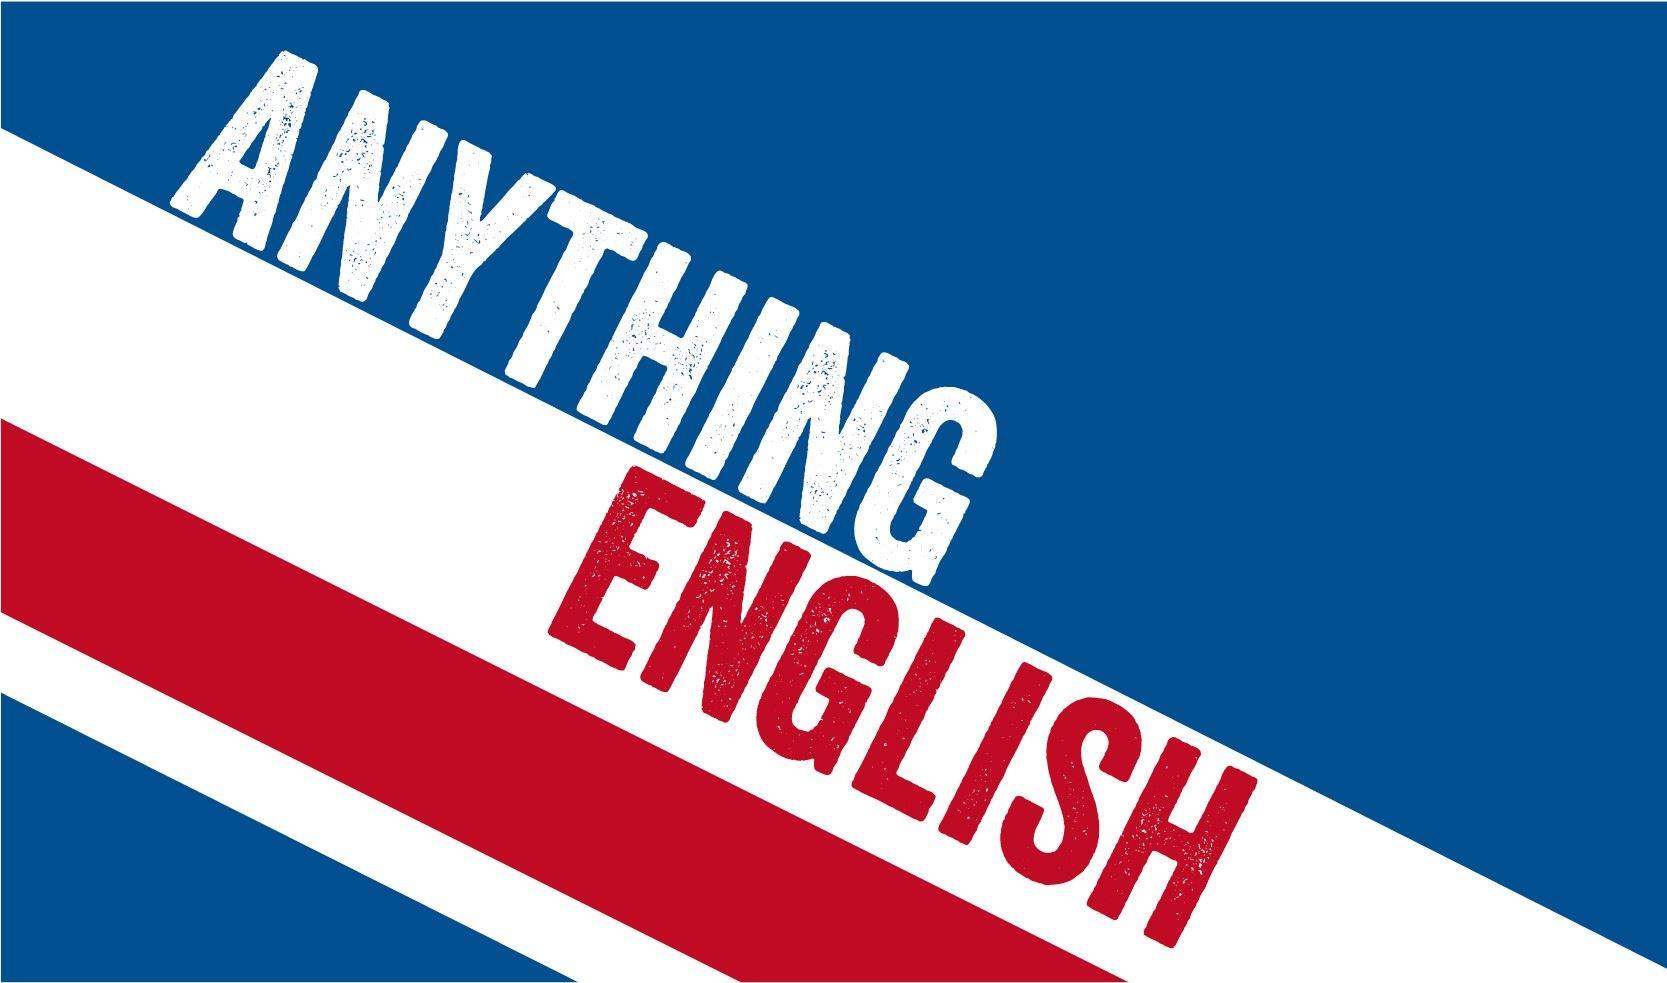 Anything English